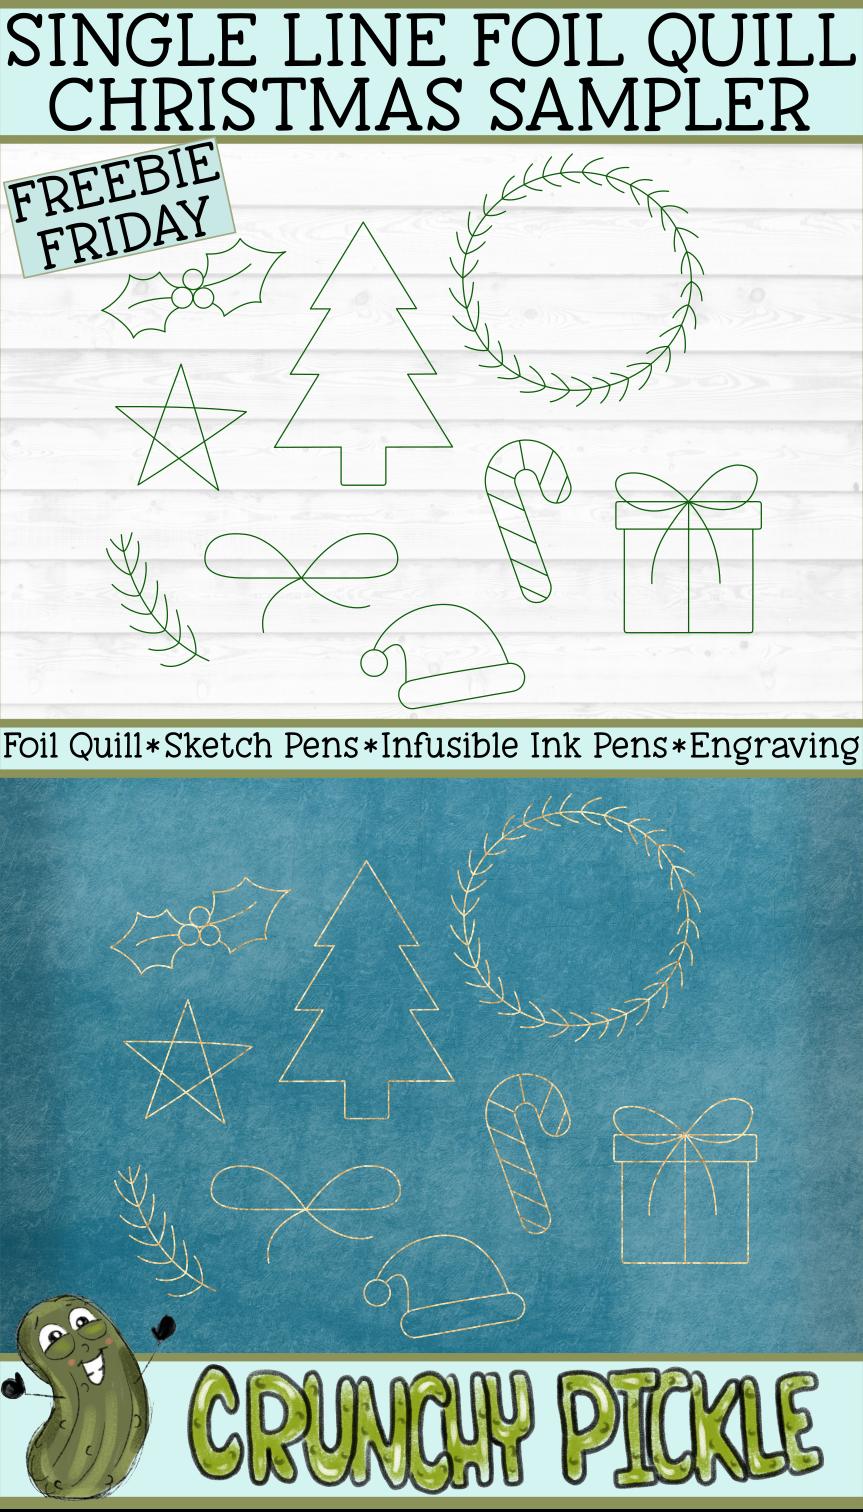 Foil Quill Christmas Sampler / Single Line Sketch SVG example image 3